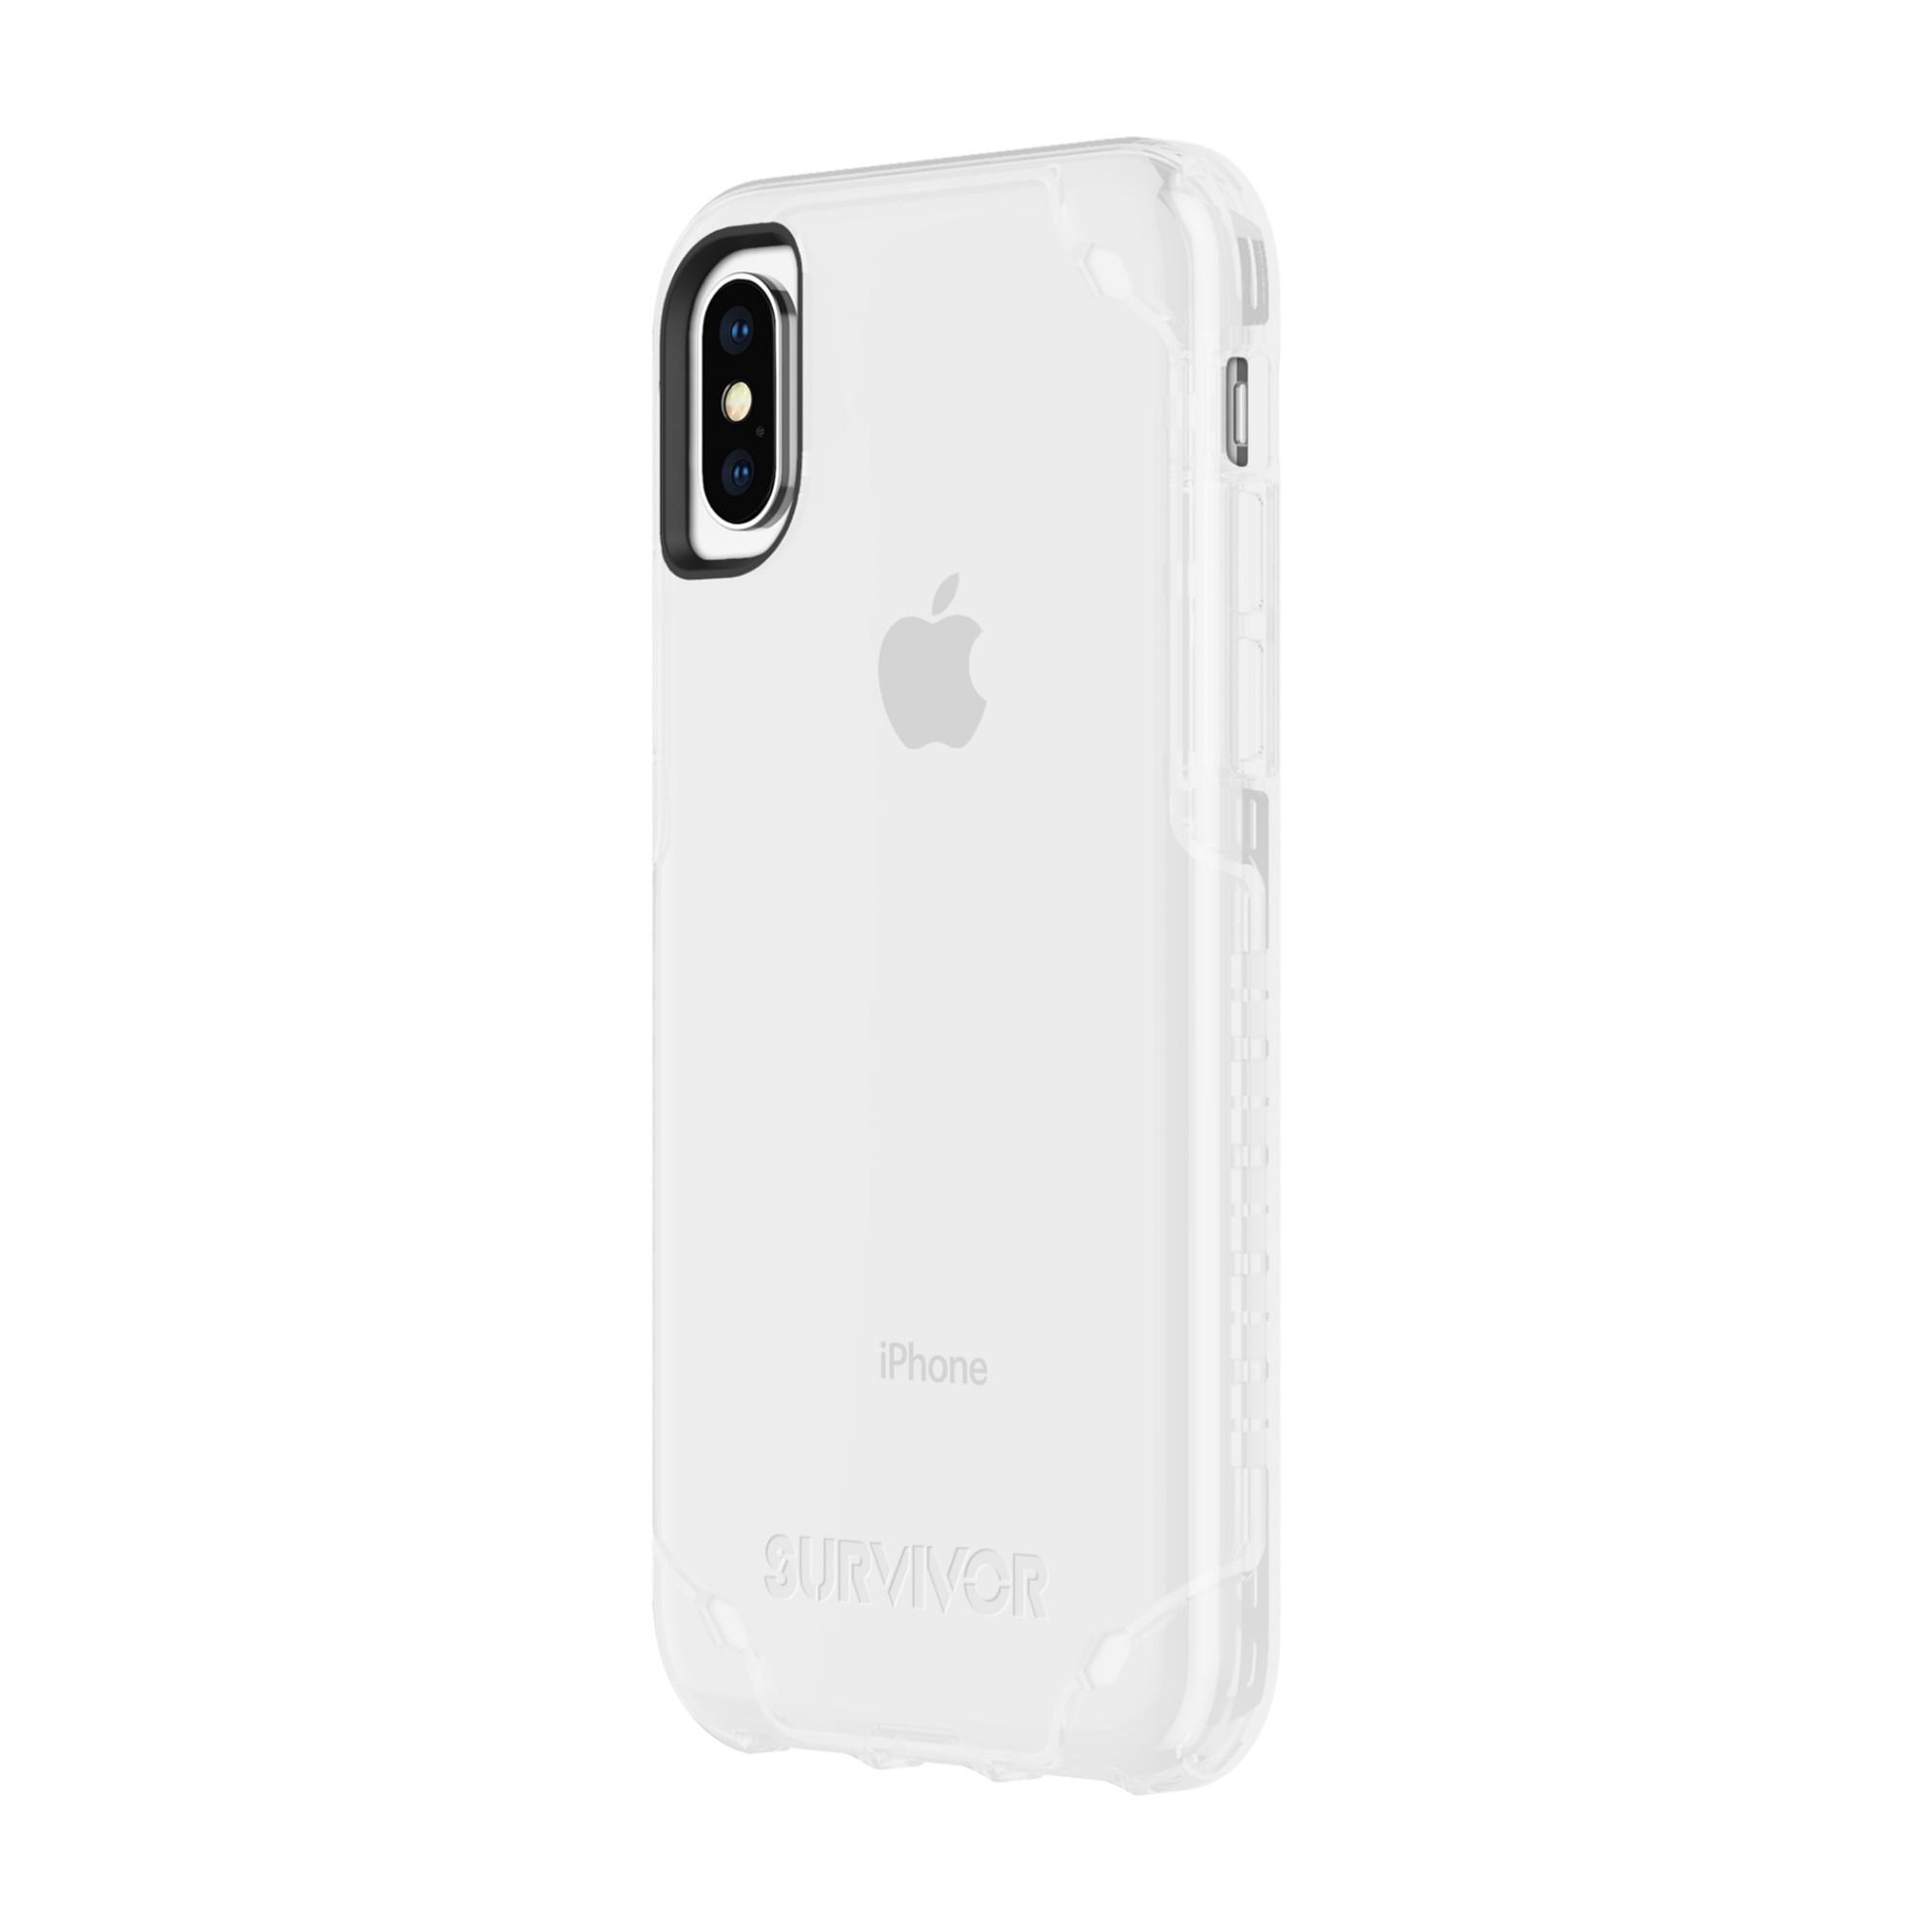 "Incipio Survivor Strong mobile phone case 14.7 cm (5.8"") Cover Transparent"